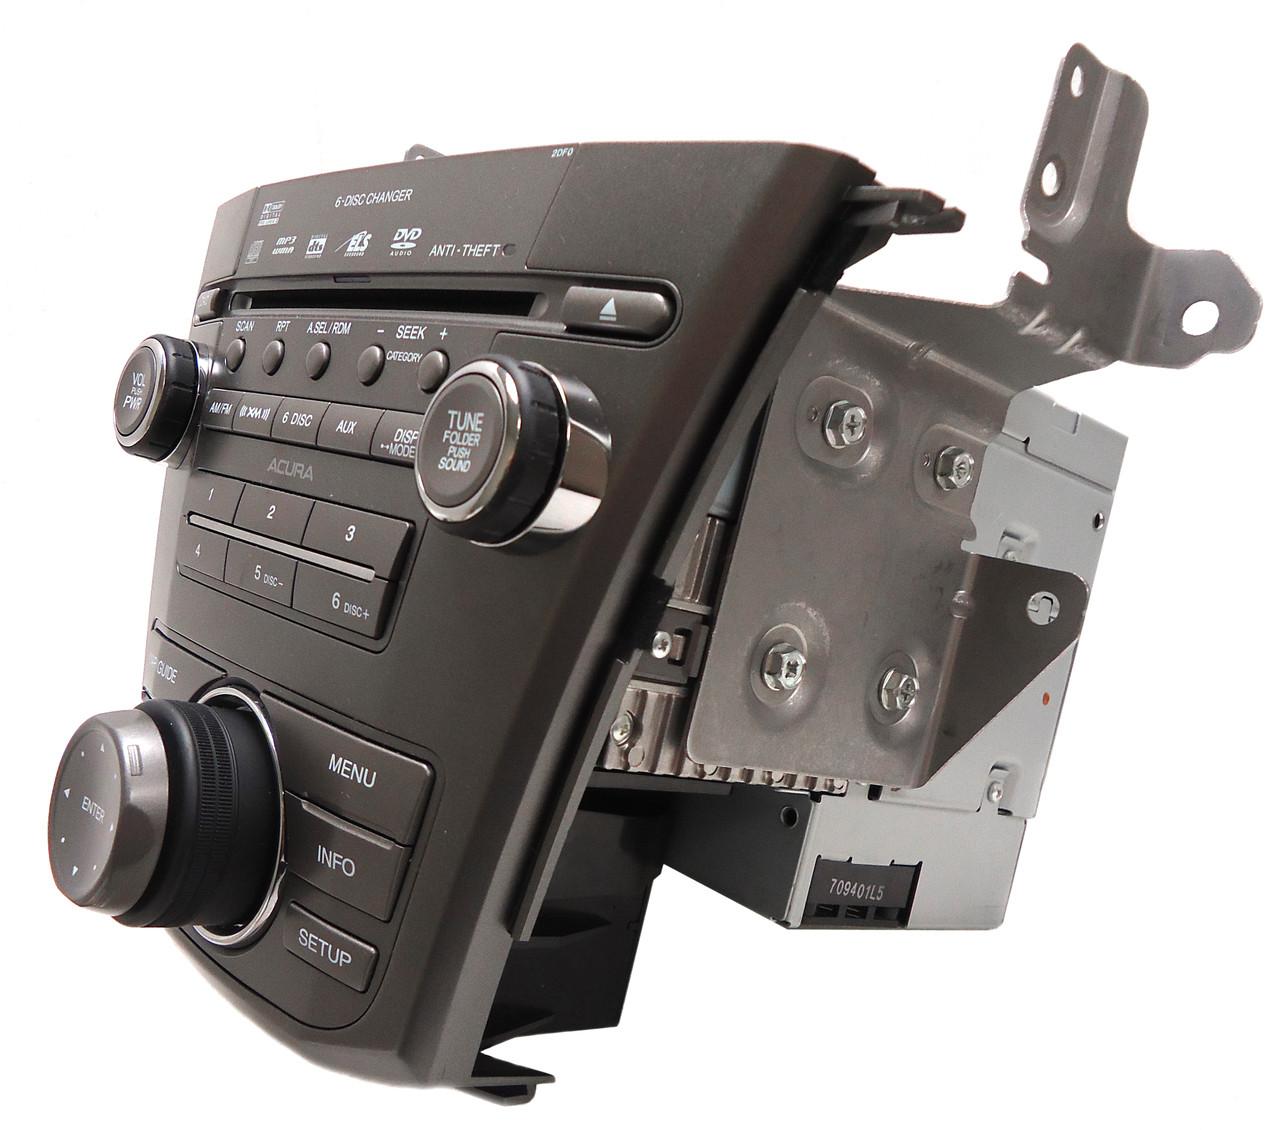 ACURA MDX Navigation GPS Radio 6 Disc CD Changer Player